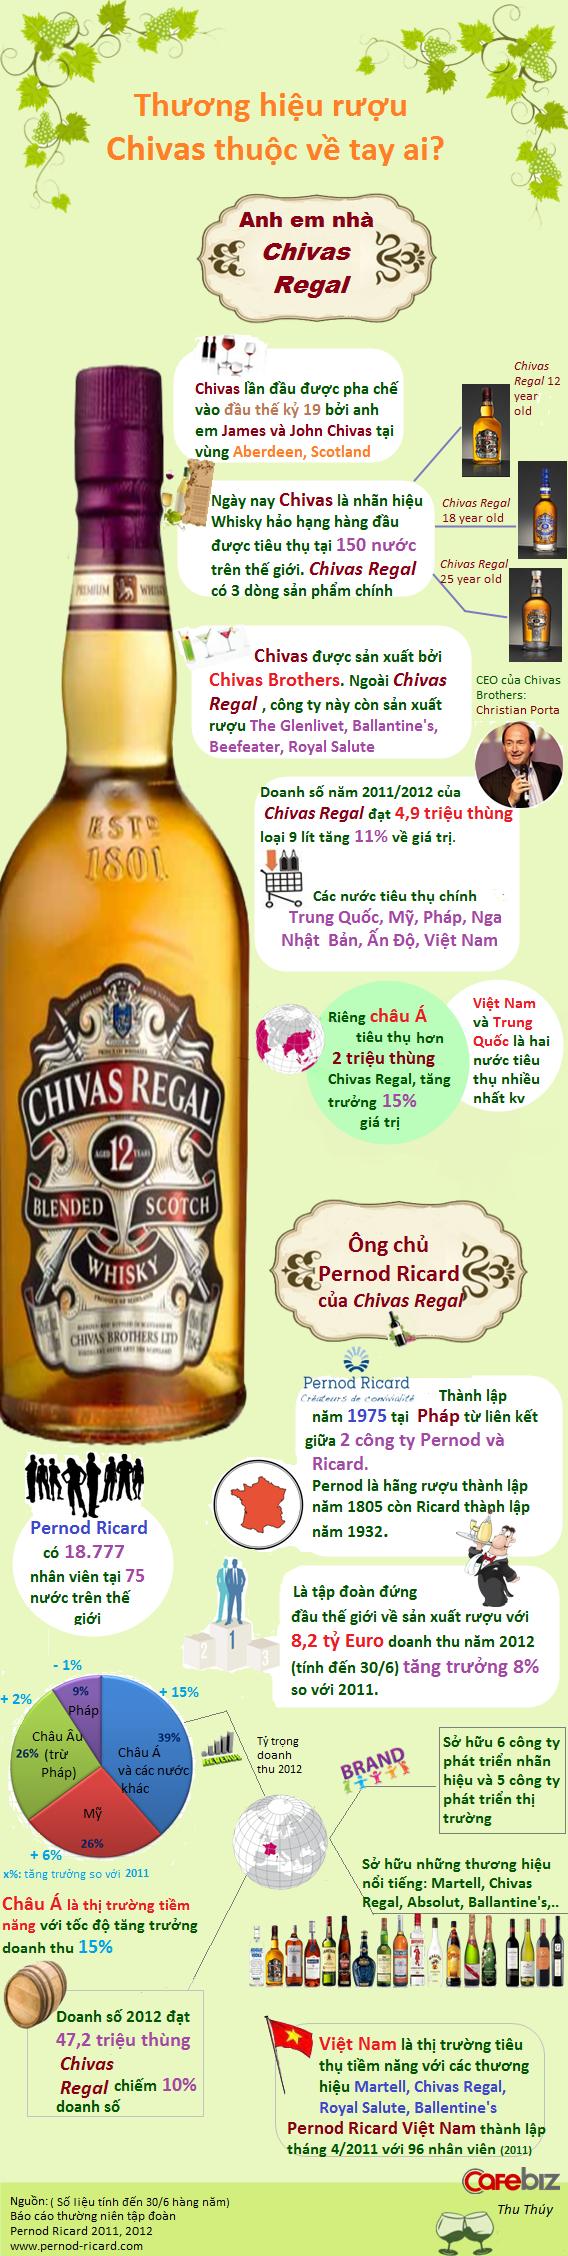 infographic pernod ricard dai gia ruou so 1 the gioi la ai [Infographic] Pernod Ricard   Đại gia rượu số 1 thế giới là ai?